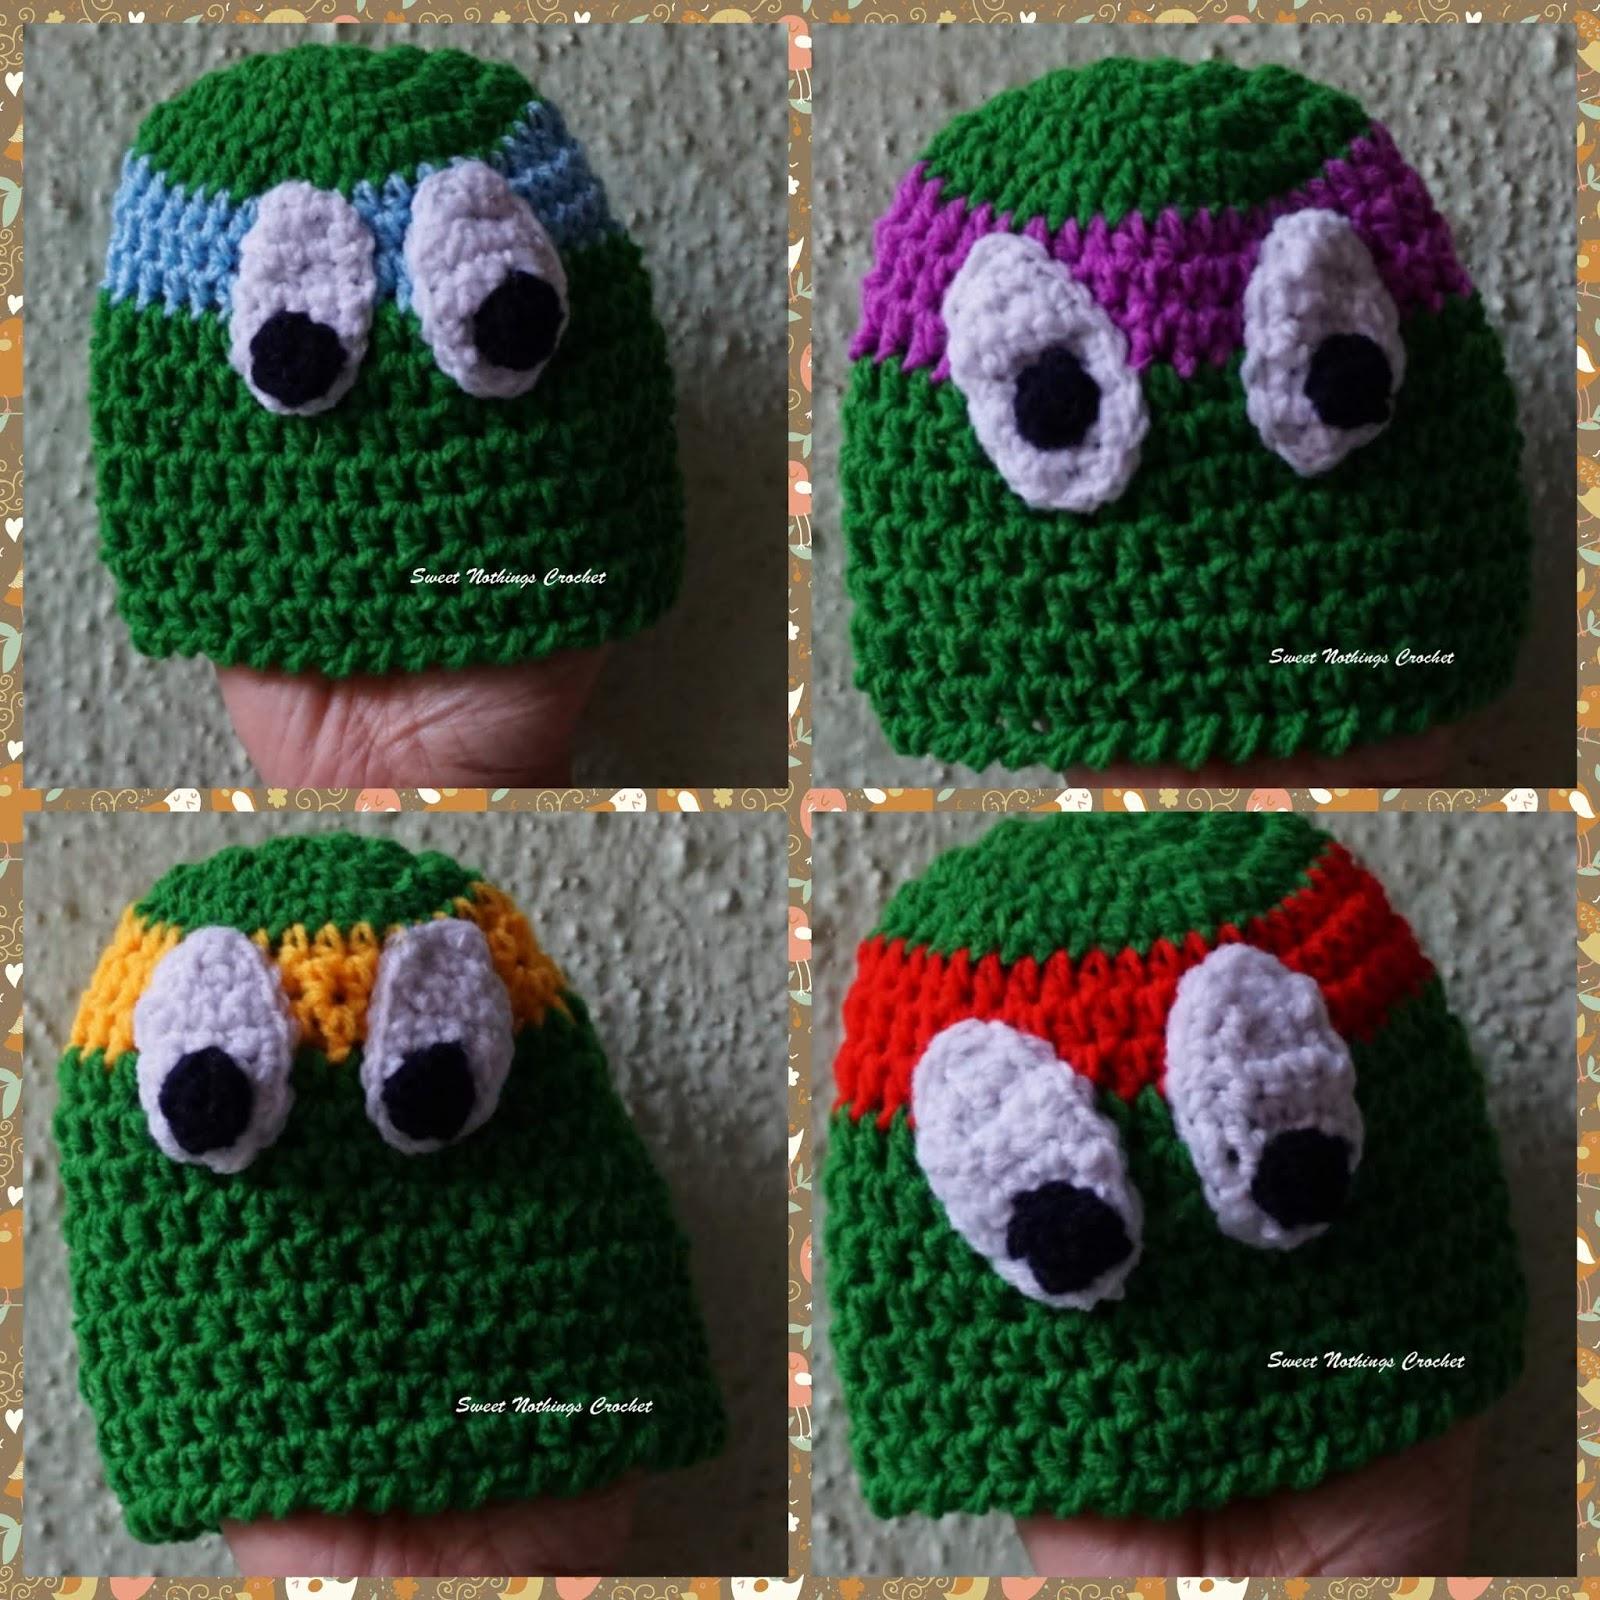 79e4b49df1f Sweet Nothings Crochet  PREEMIE CAPS - 5   TMNT CAPS